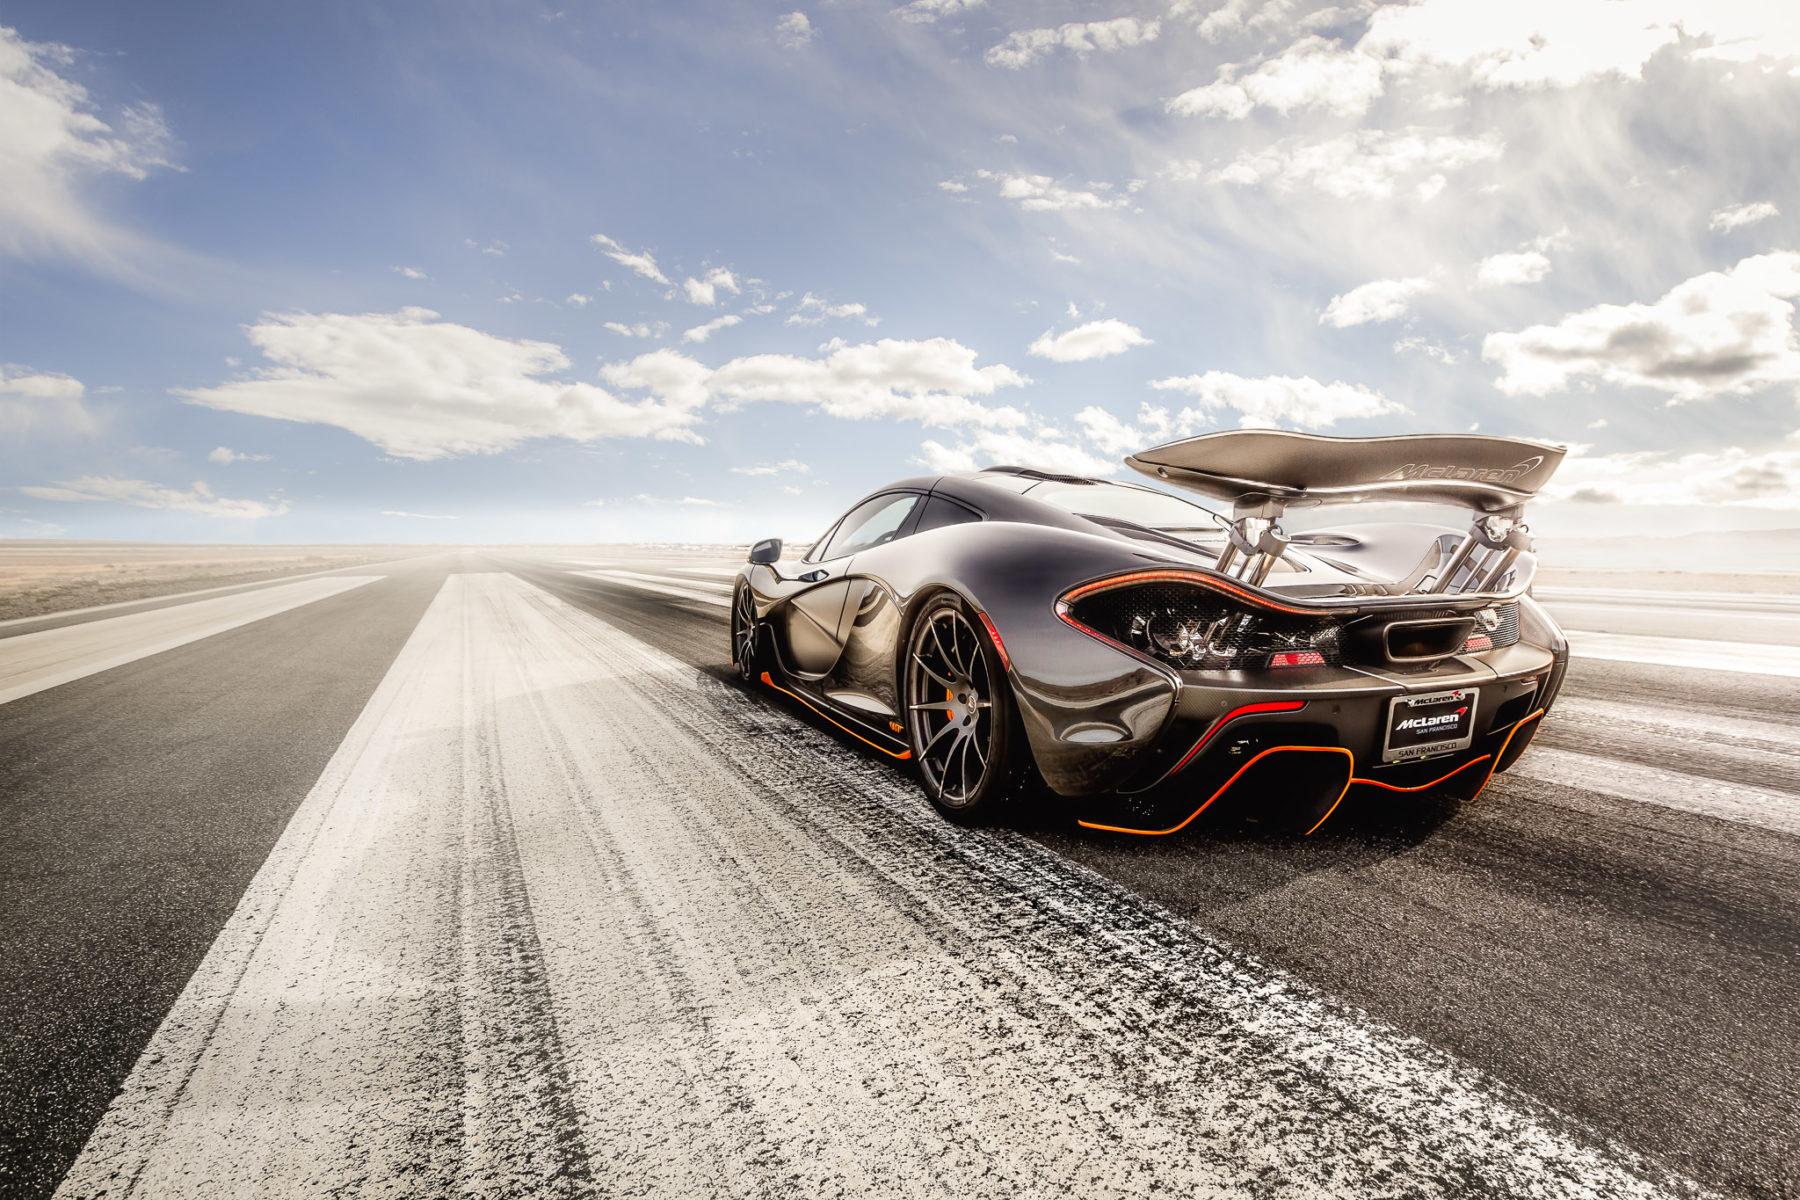 Drag Car 4k Wallpaper Bugatti S 918 S And P1 S Oh My Shift S3ctor Drag